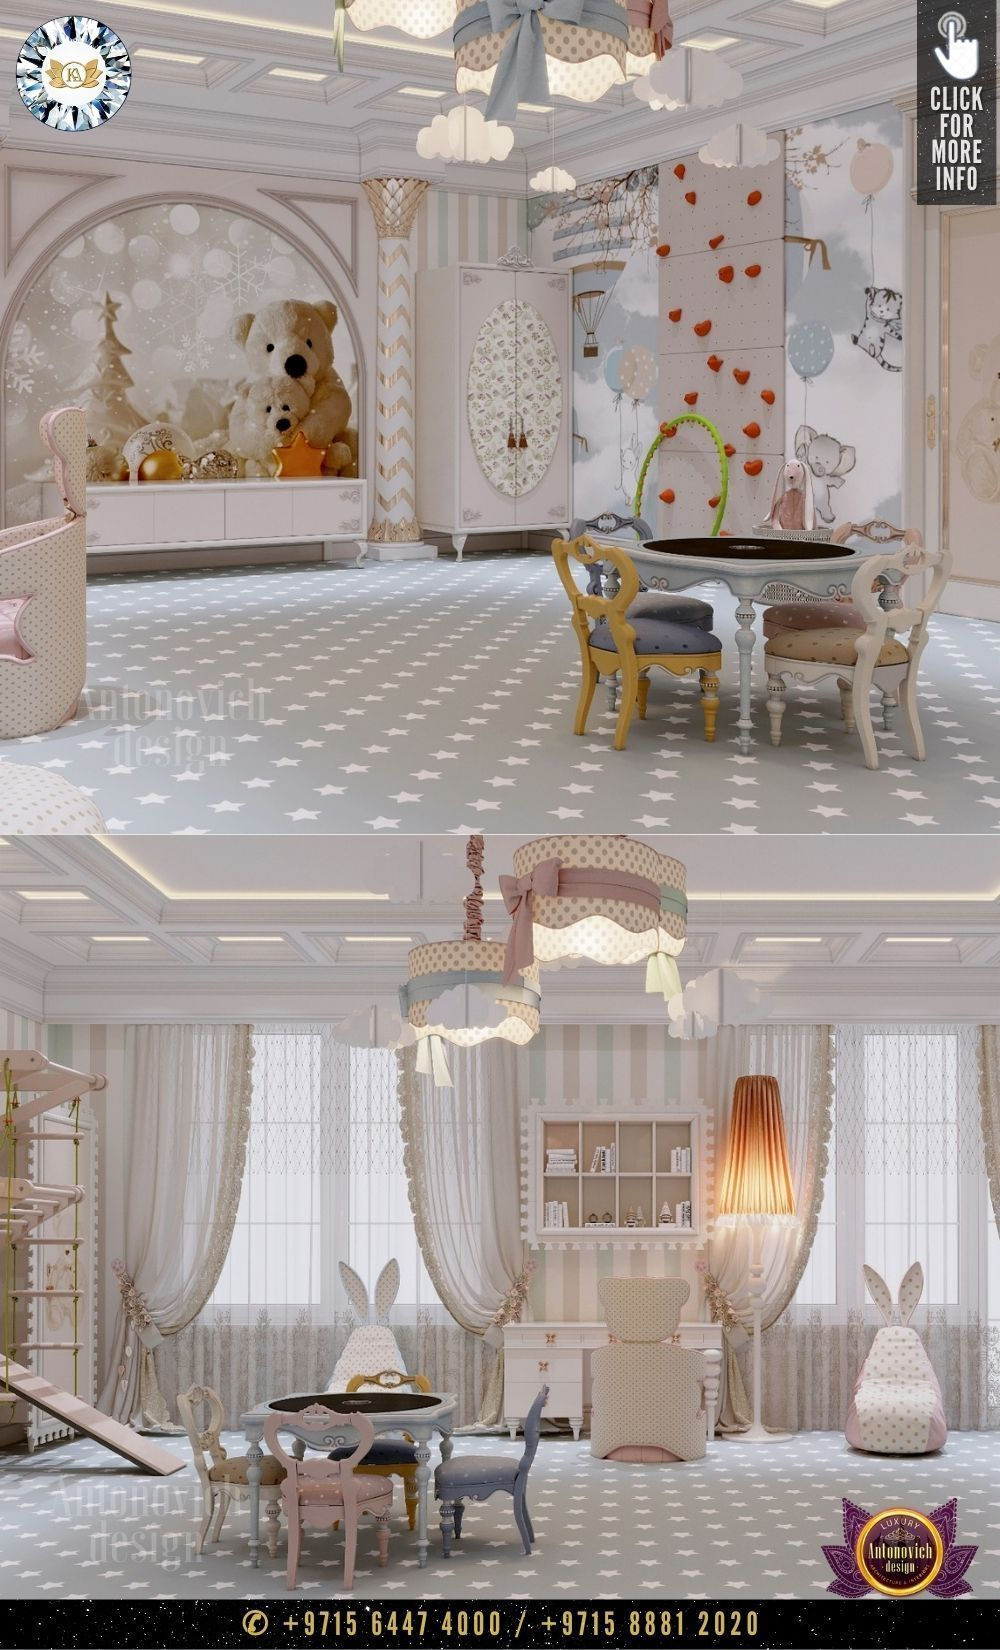 Pin On Bedroom Design Interesnye Idei Dlya Spalni